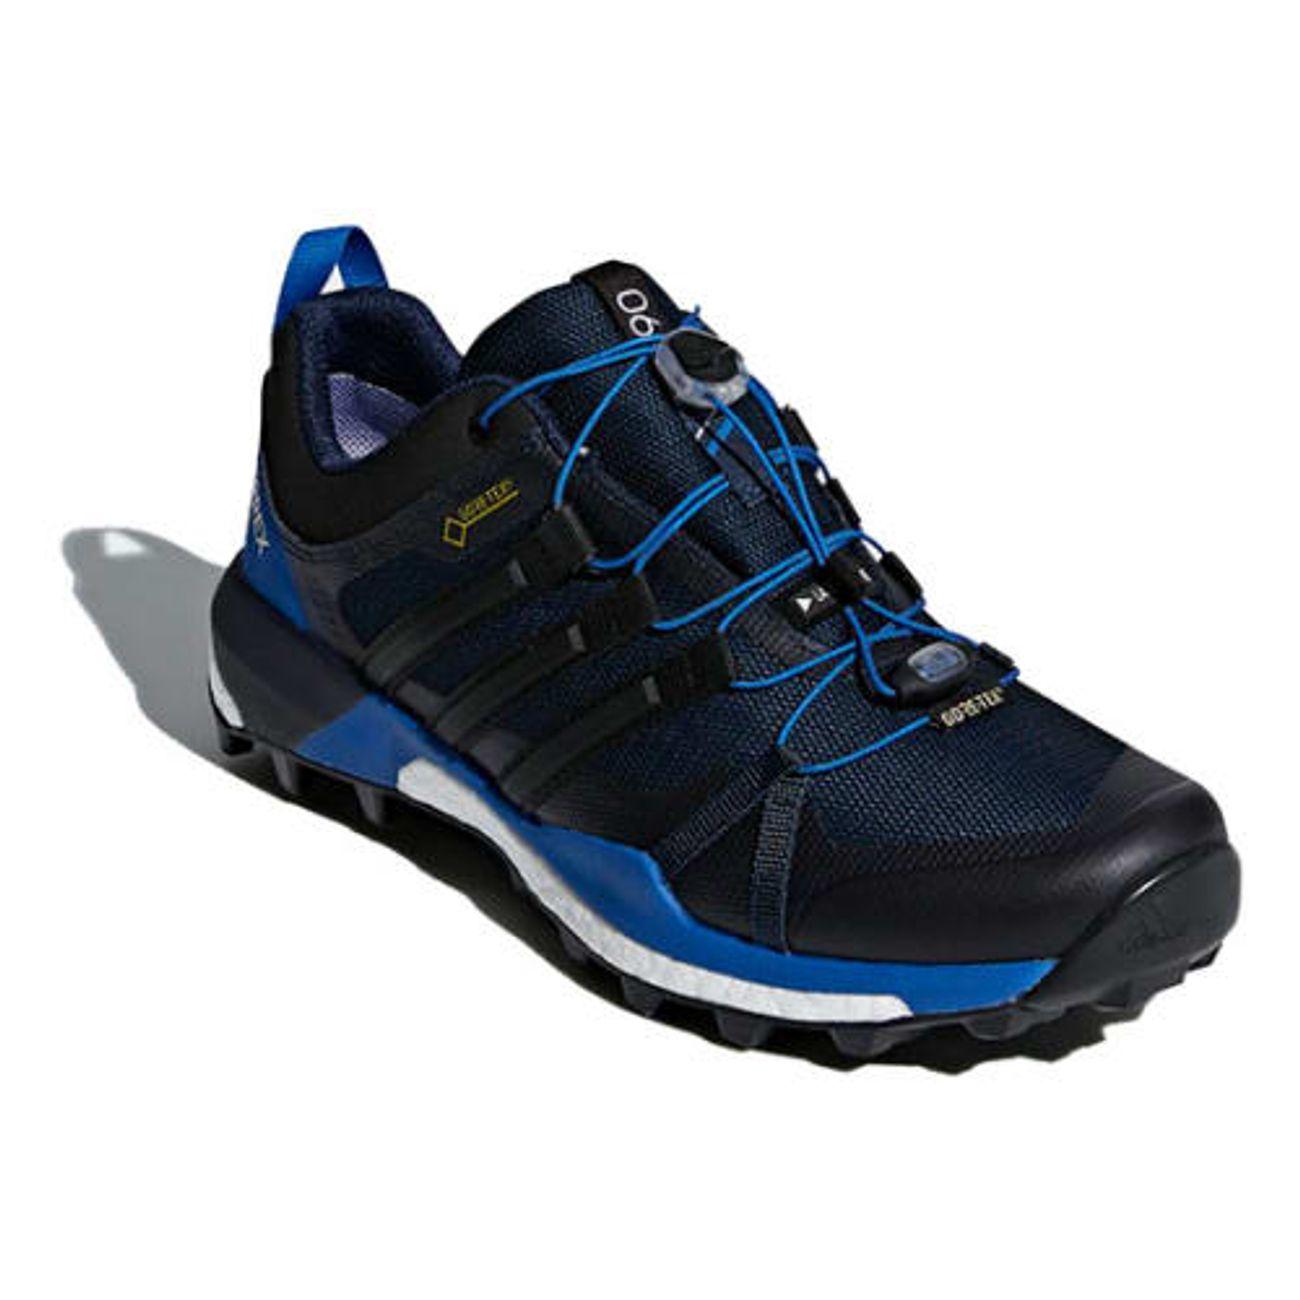 Weuwqvzv Gtx Skychaser Adidas Bleu Terrex Noir Chaussures Y1vYqE4Aw